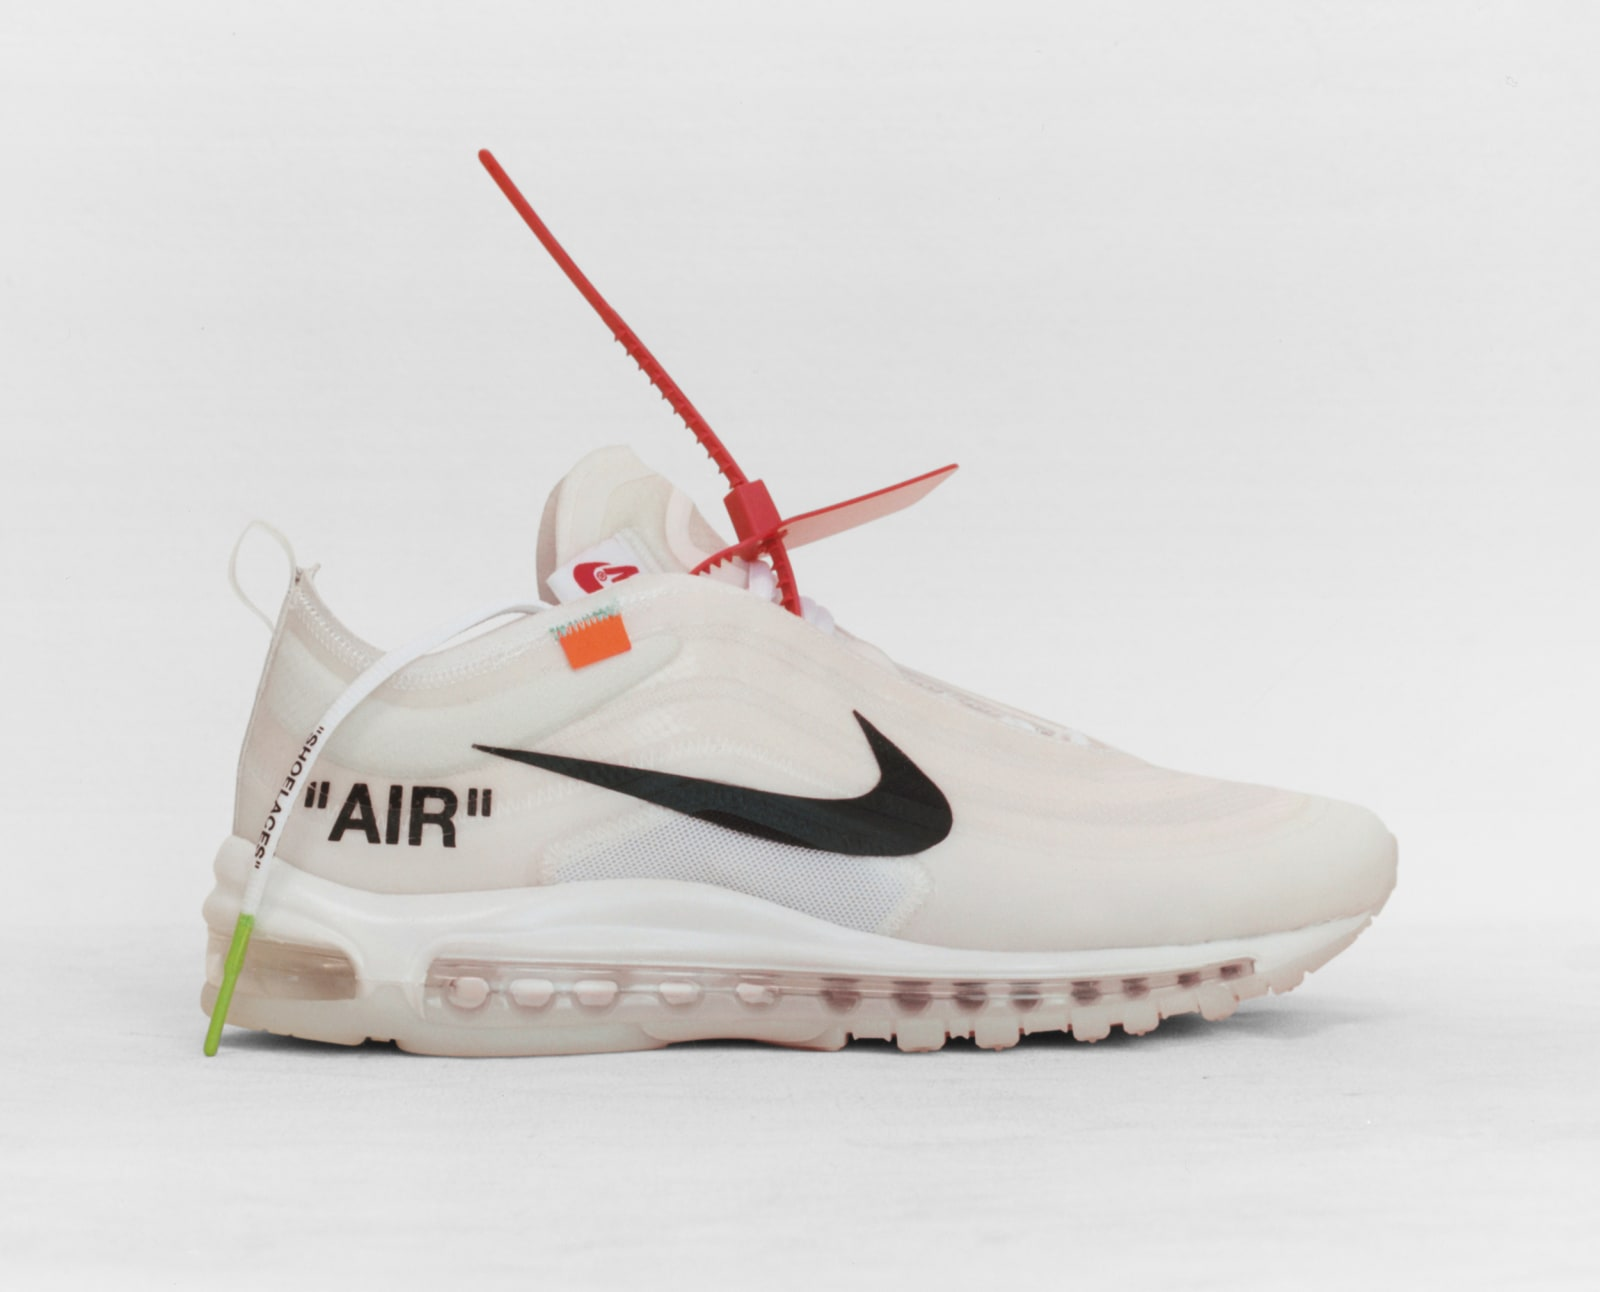 b4606d9093 Off-White x Nike Air Max 97 OG Black/Cone/Black/White AJ4585-001 Off ...